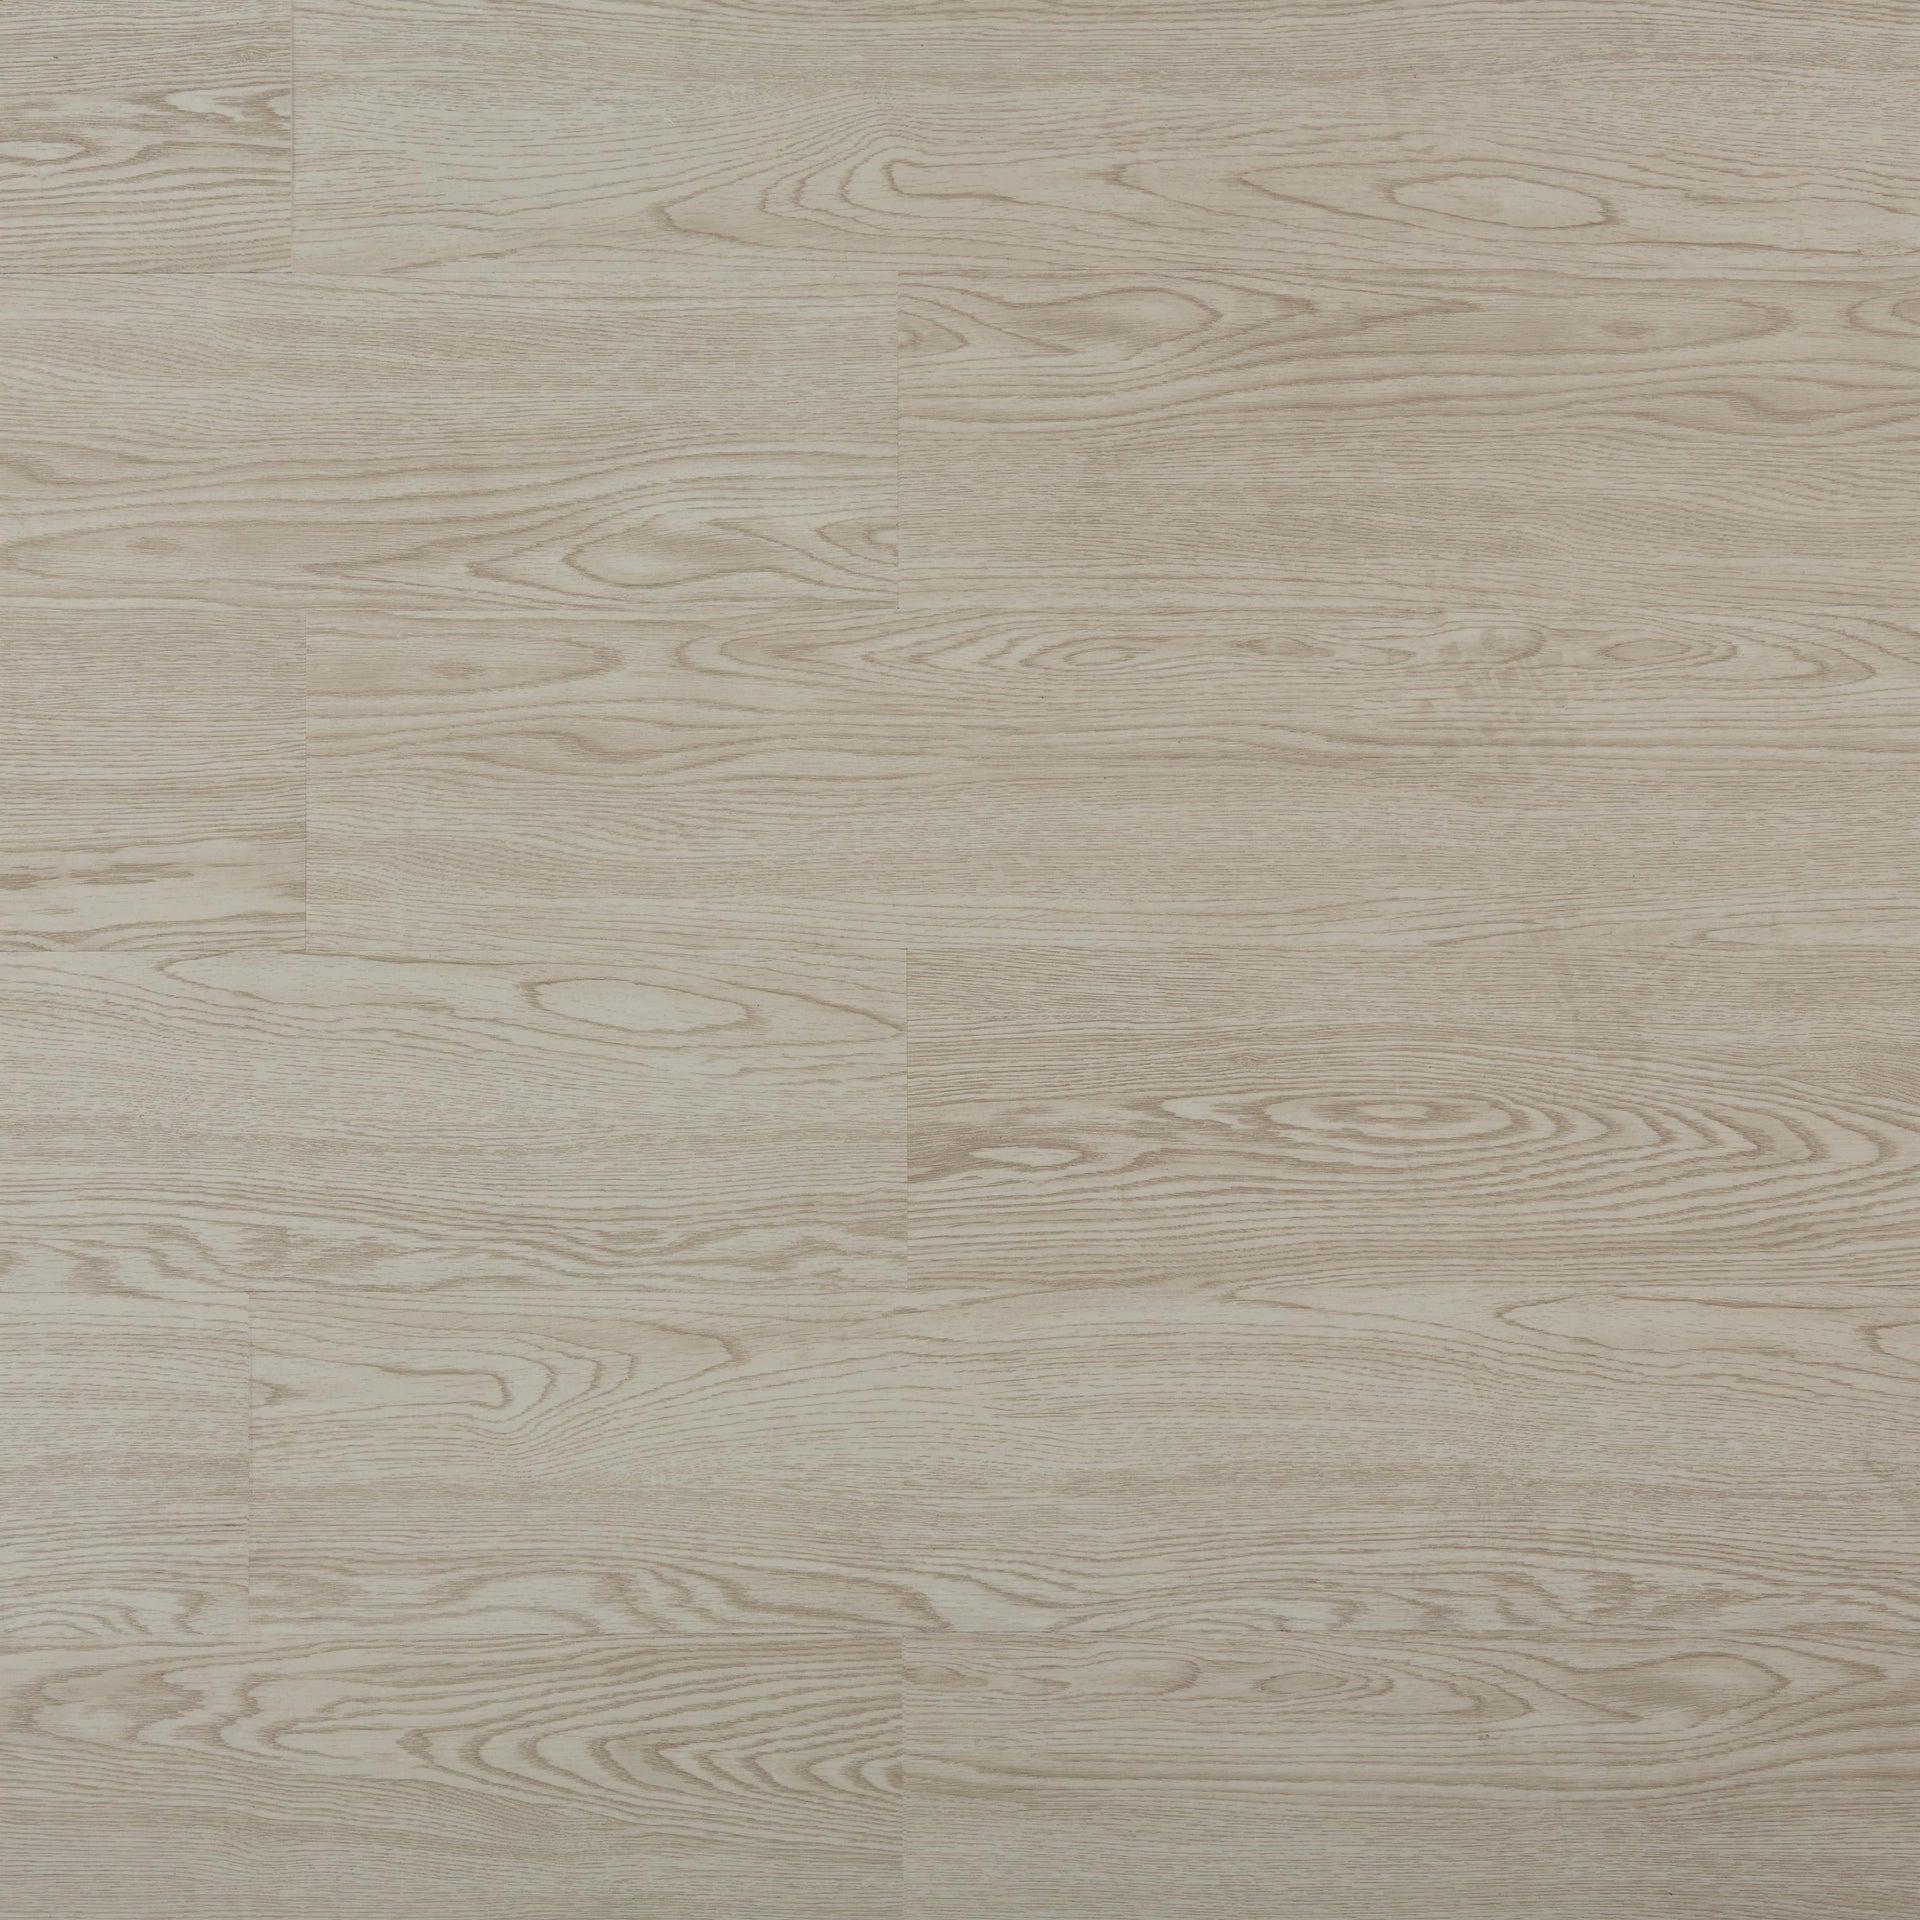 Pavimento PVC adesivo Whiwood Sp 1.8 mm bianco - 2